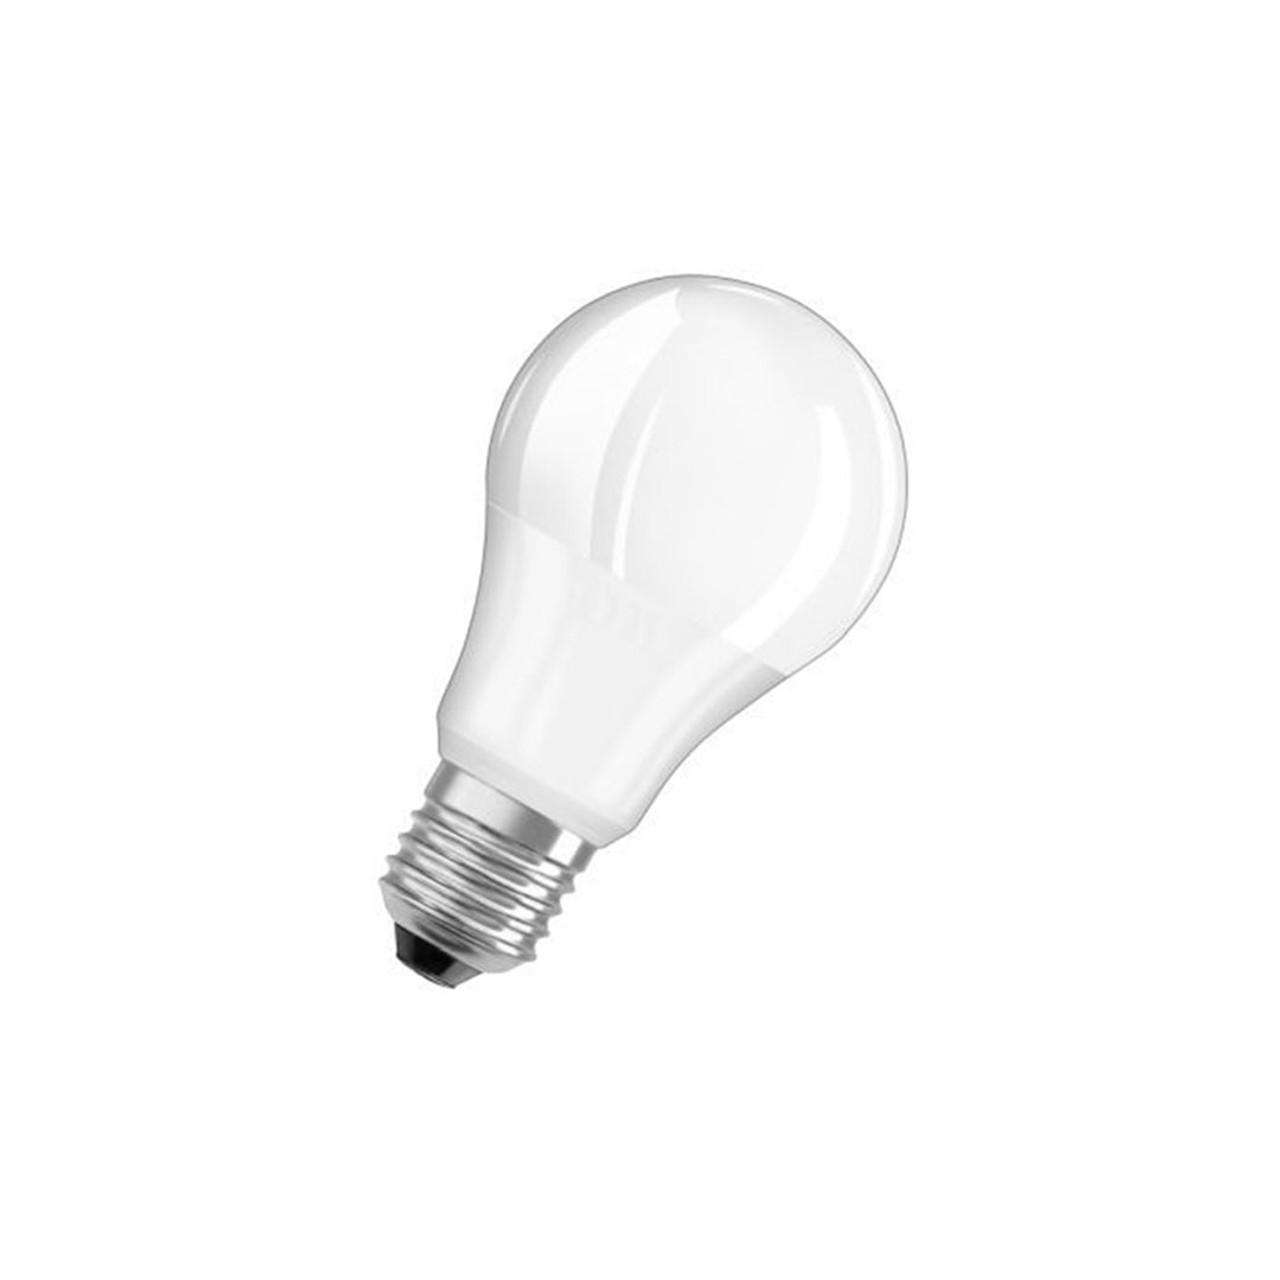 Globe LED E27 10w Warm White Dimmable Radium 806LM